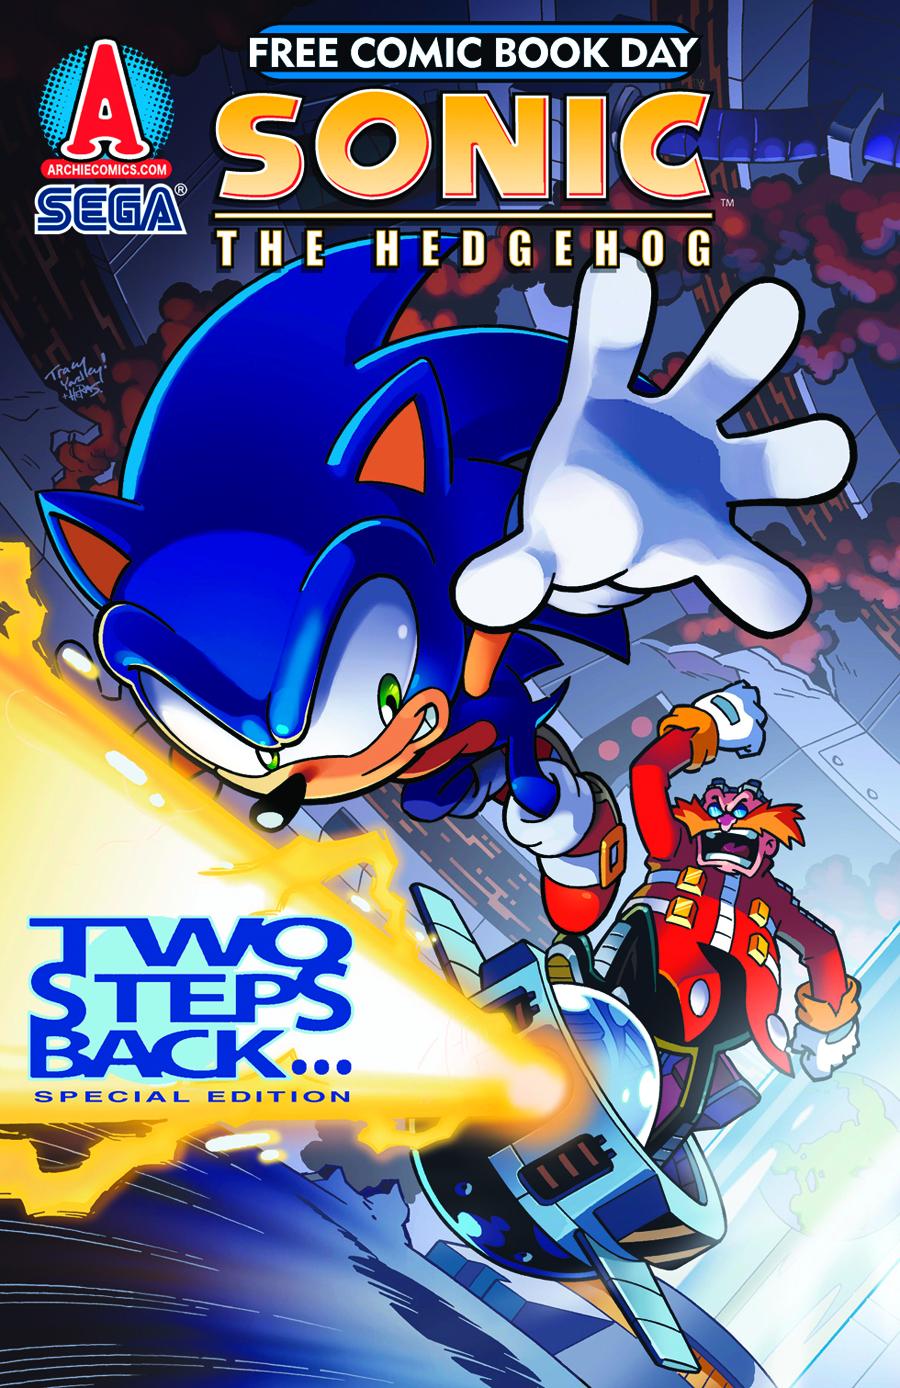 STK459223 Free Comic Book Day 2012: Reviews!